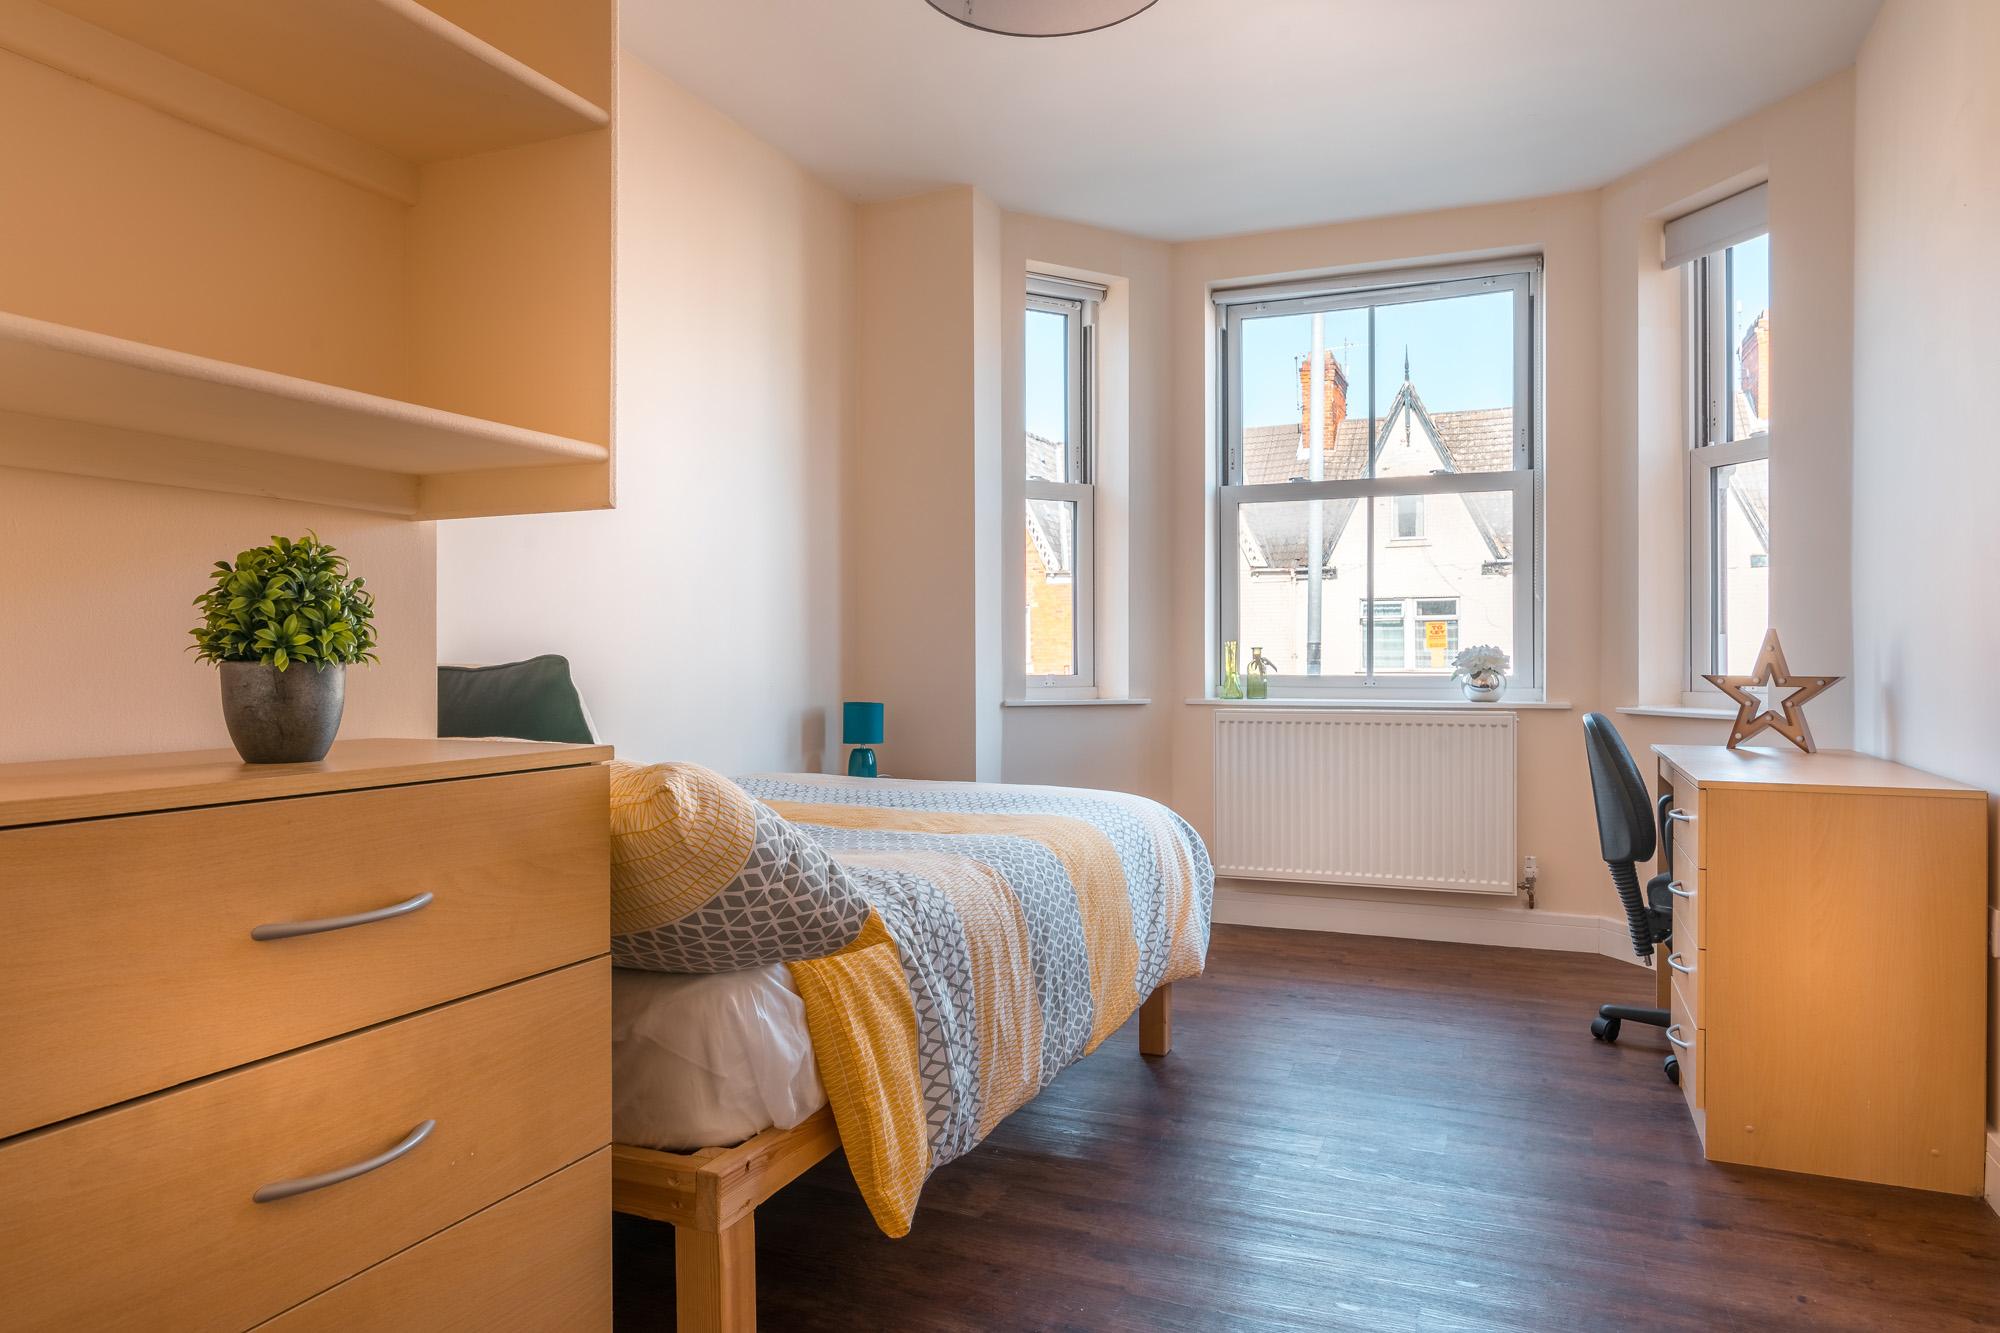 hull student housing, student apartments hull, student flats hull